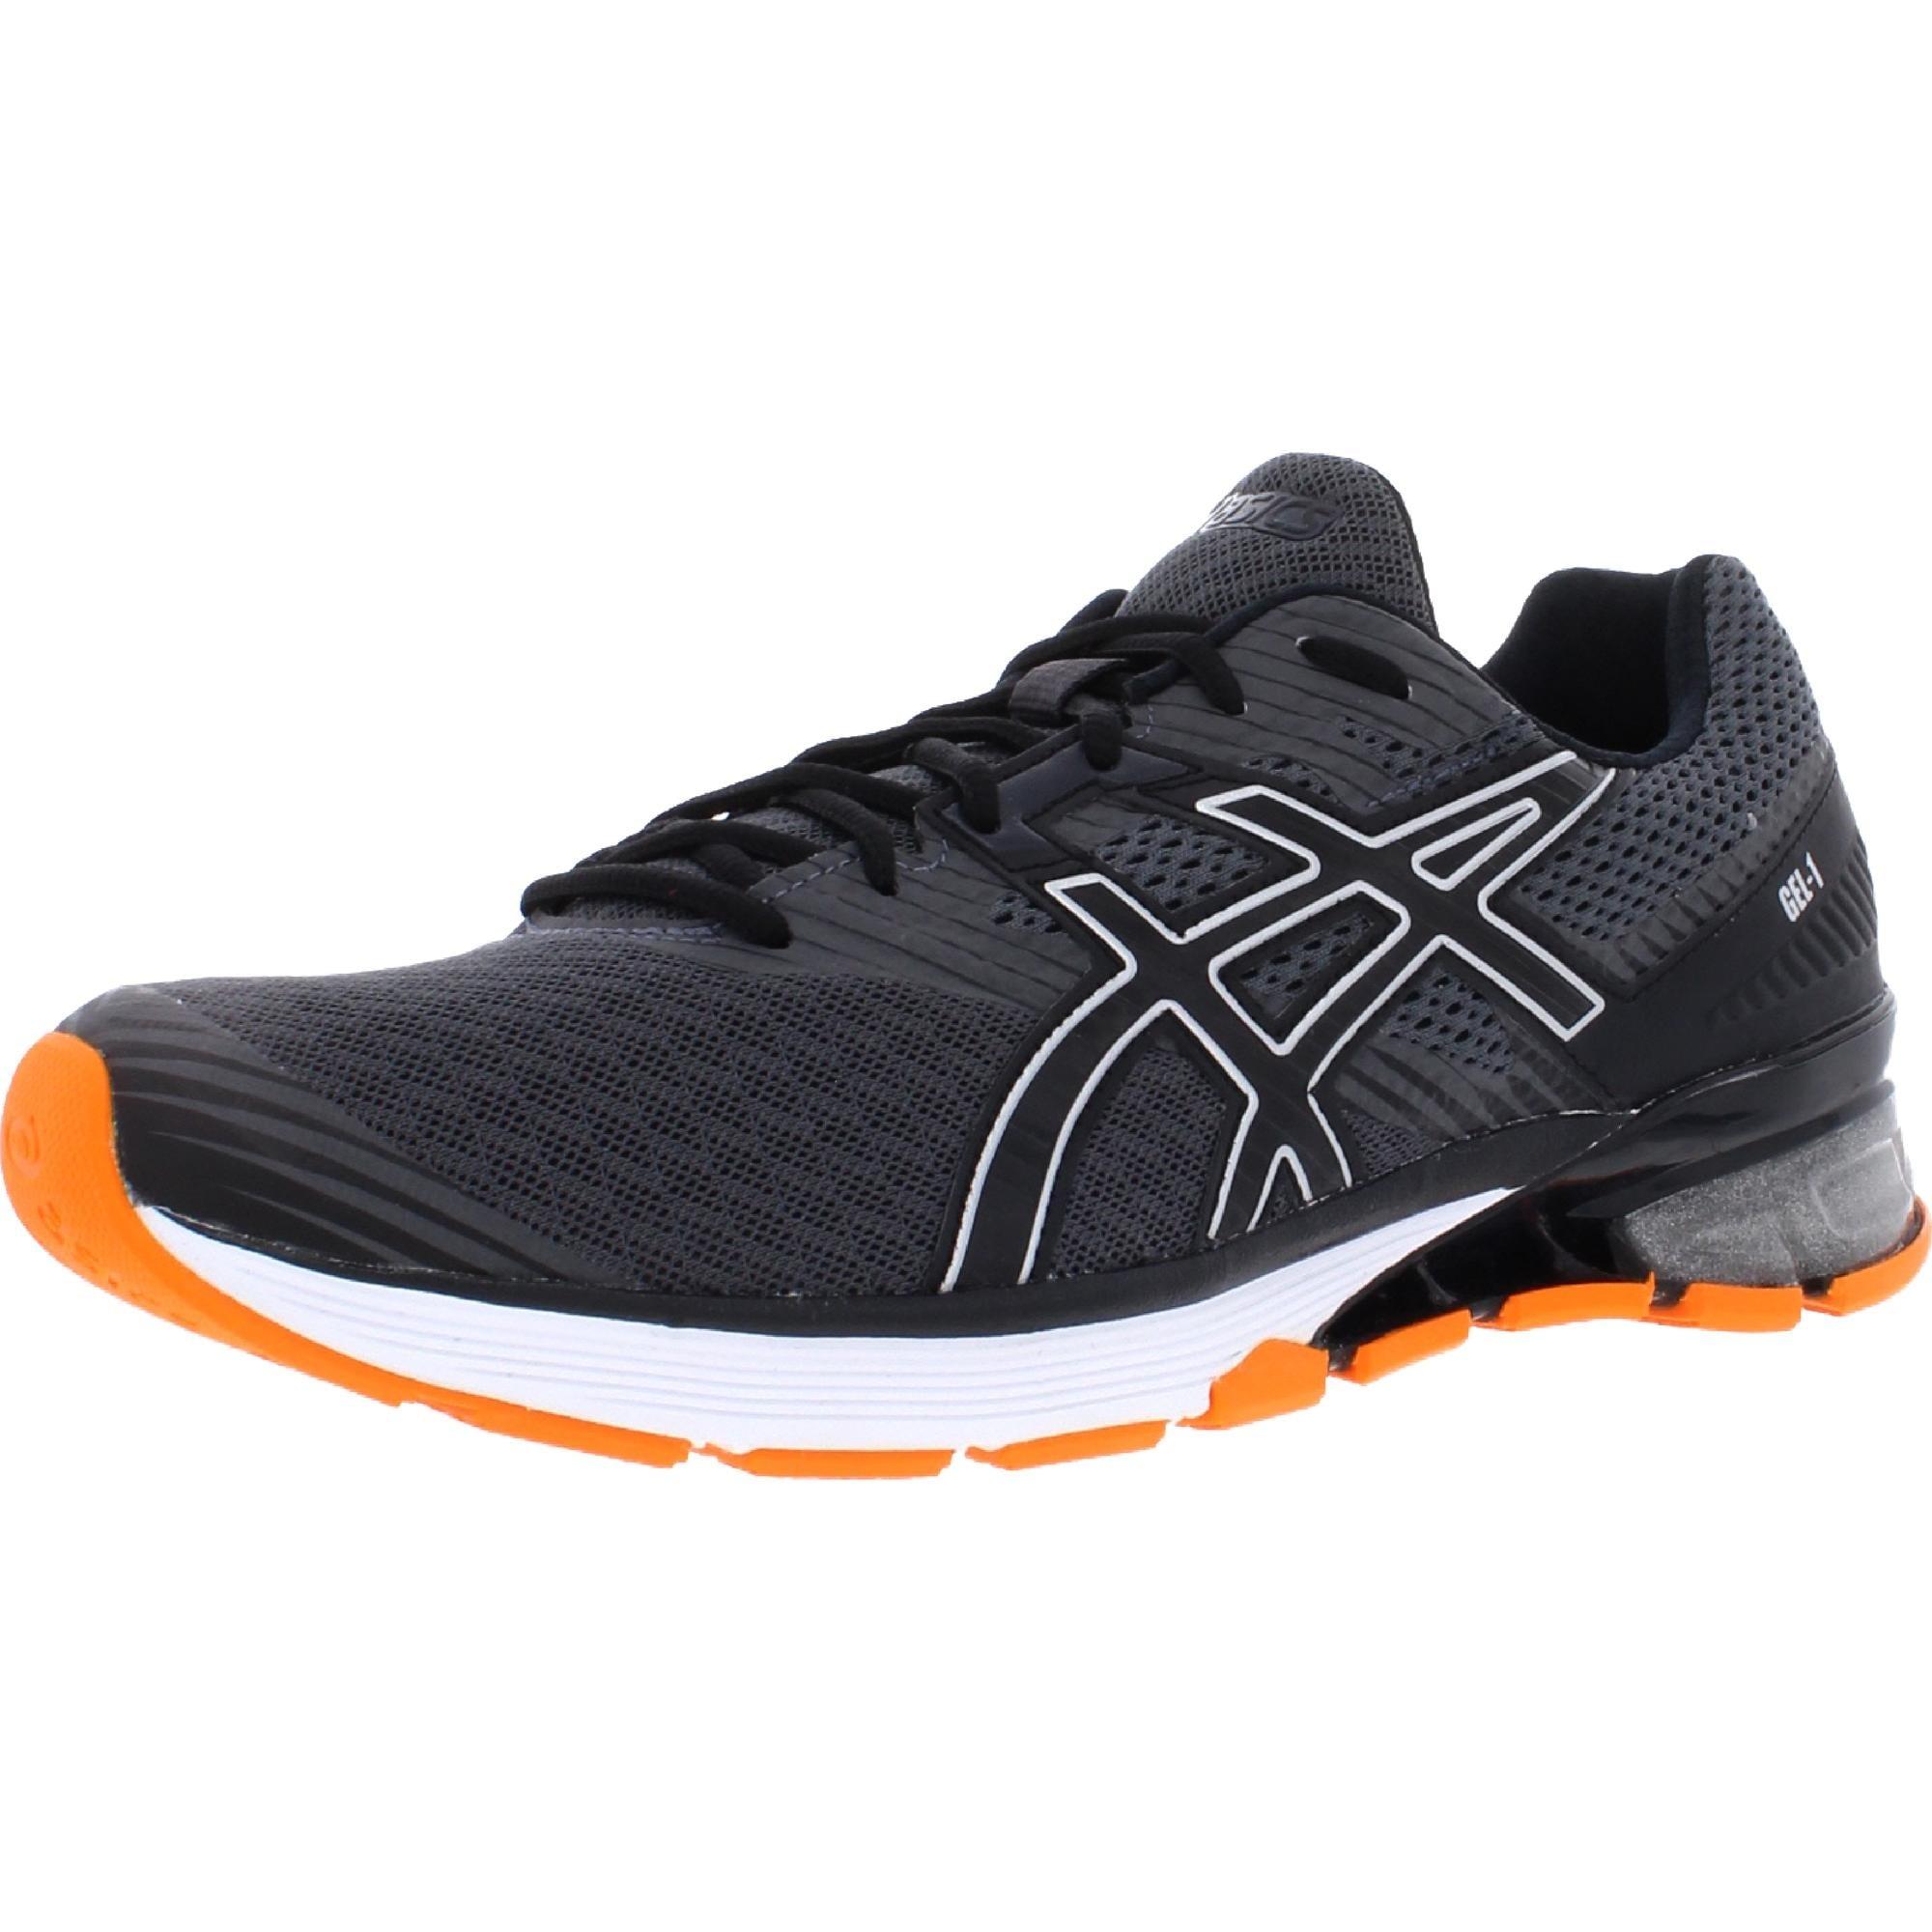 Shop Asics Mens Gel-1 Running Shoes